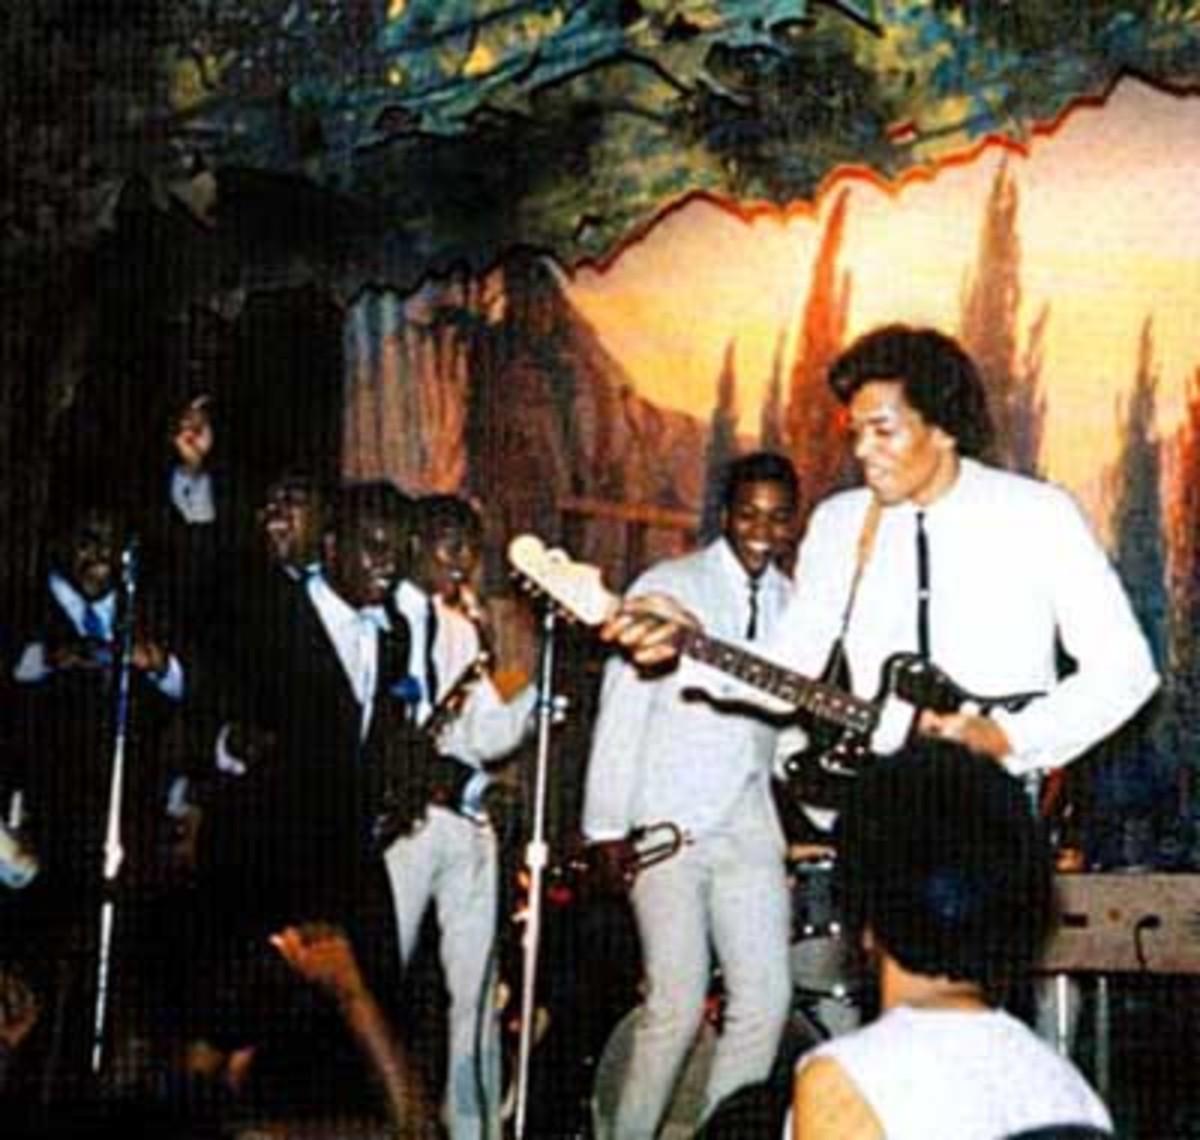 The Isley Brothers with Jimi Hendrix